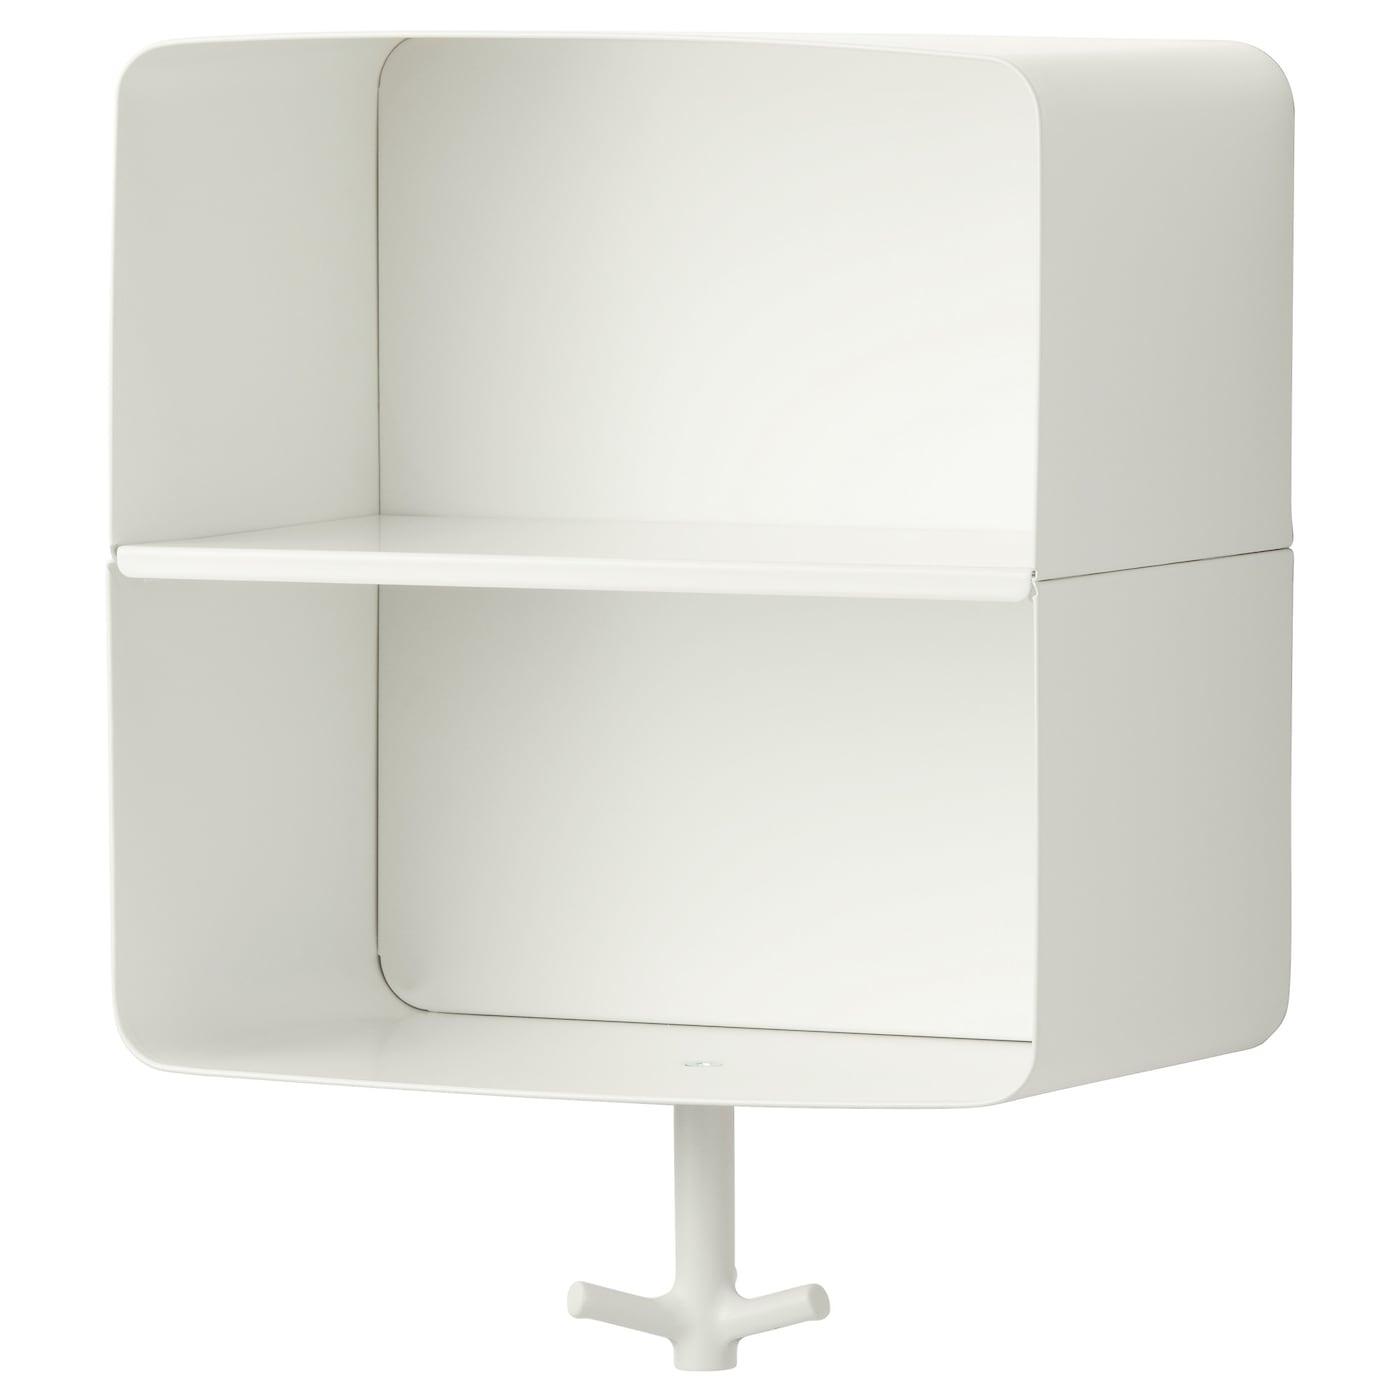 Brickan miroir avec rangement blanc 20x100 cm ikea - Ikea heure d ouverture ...